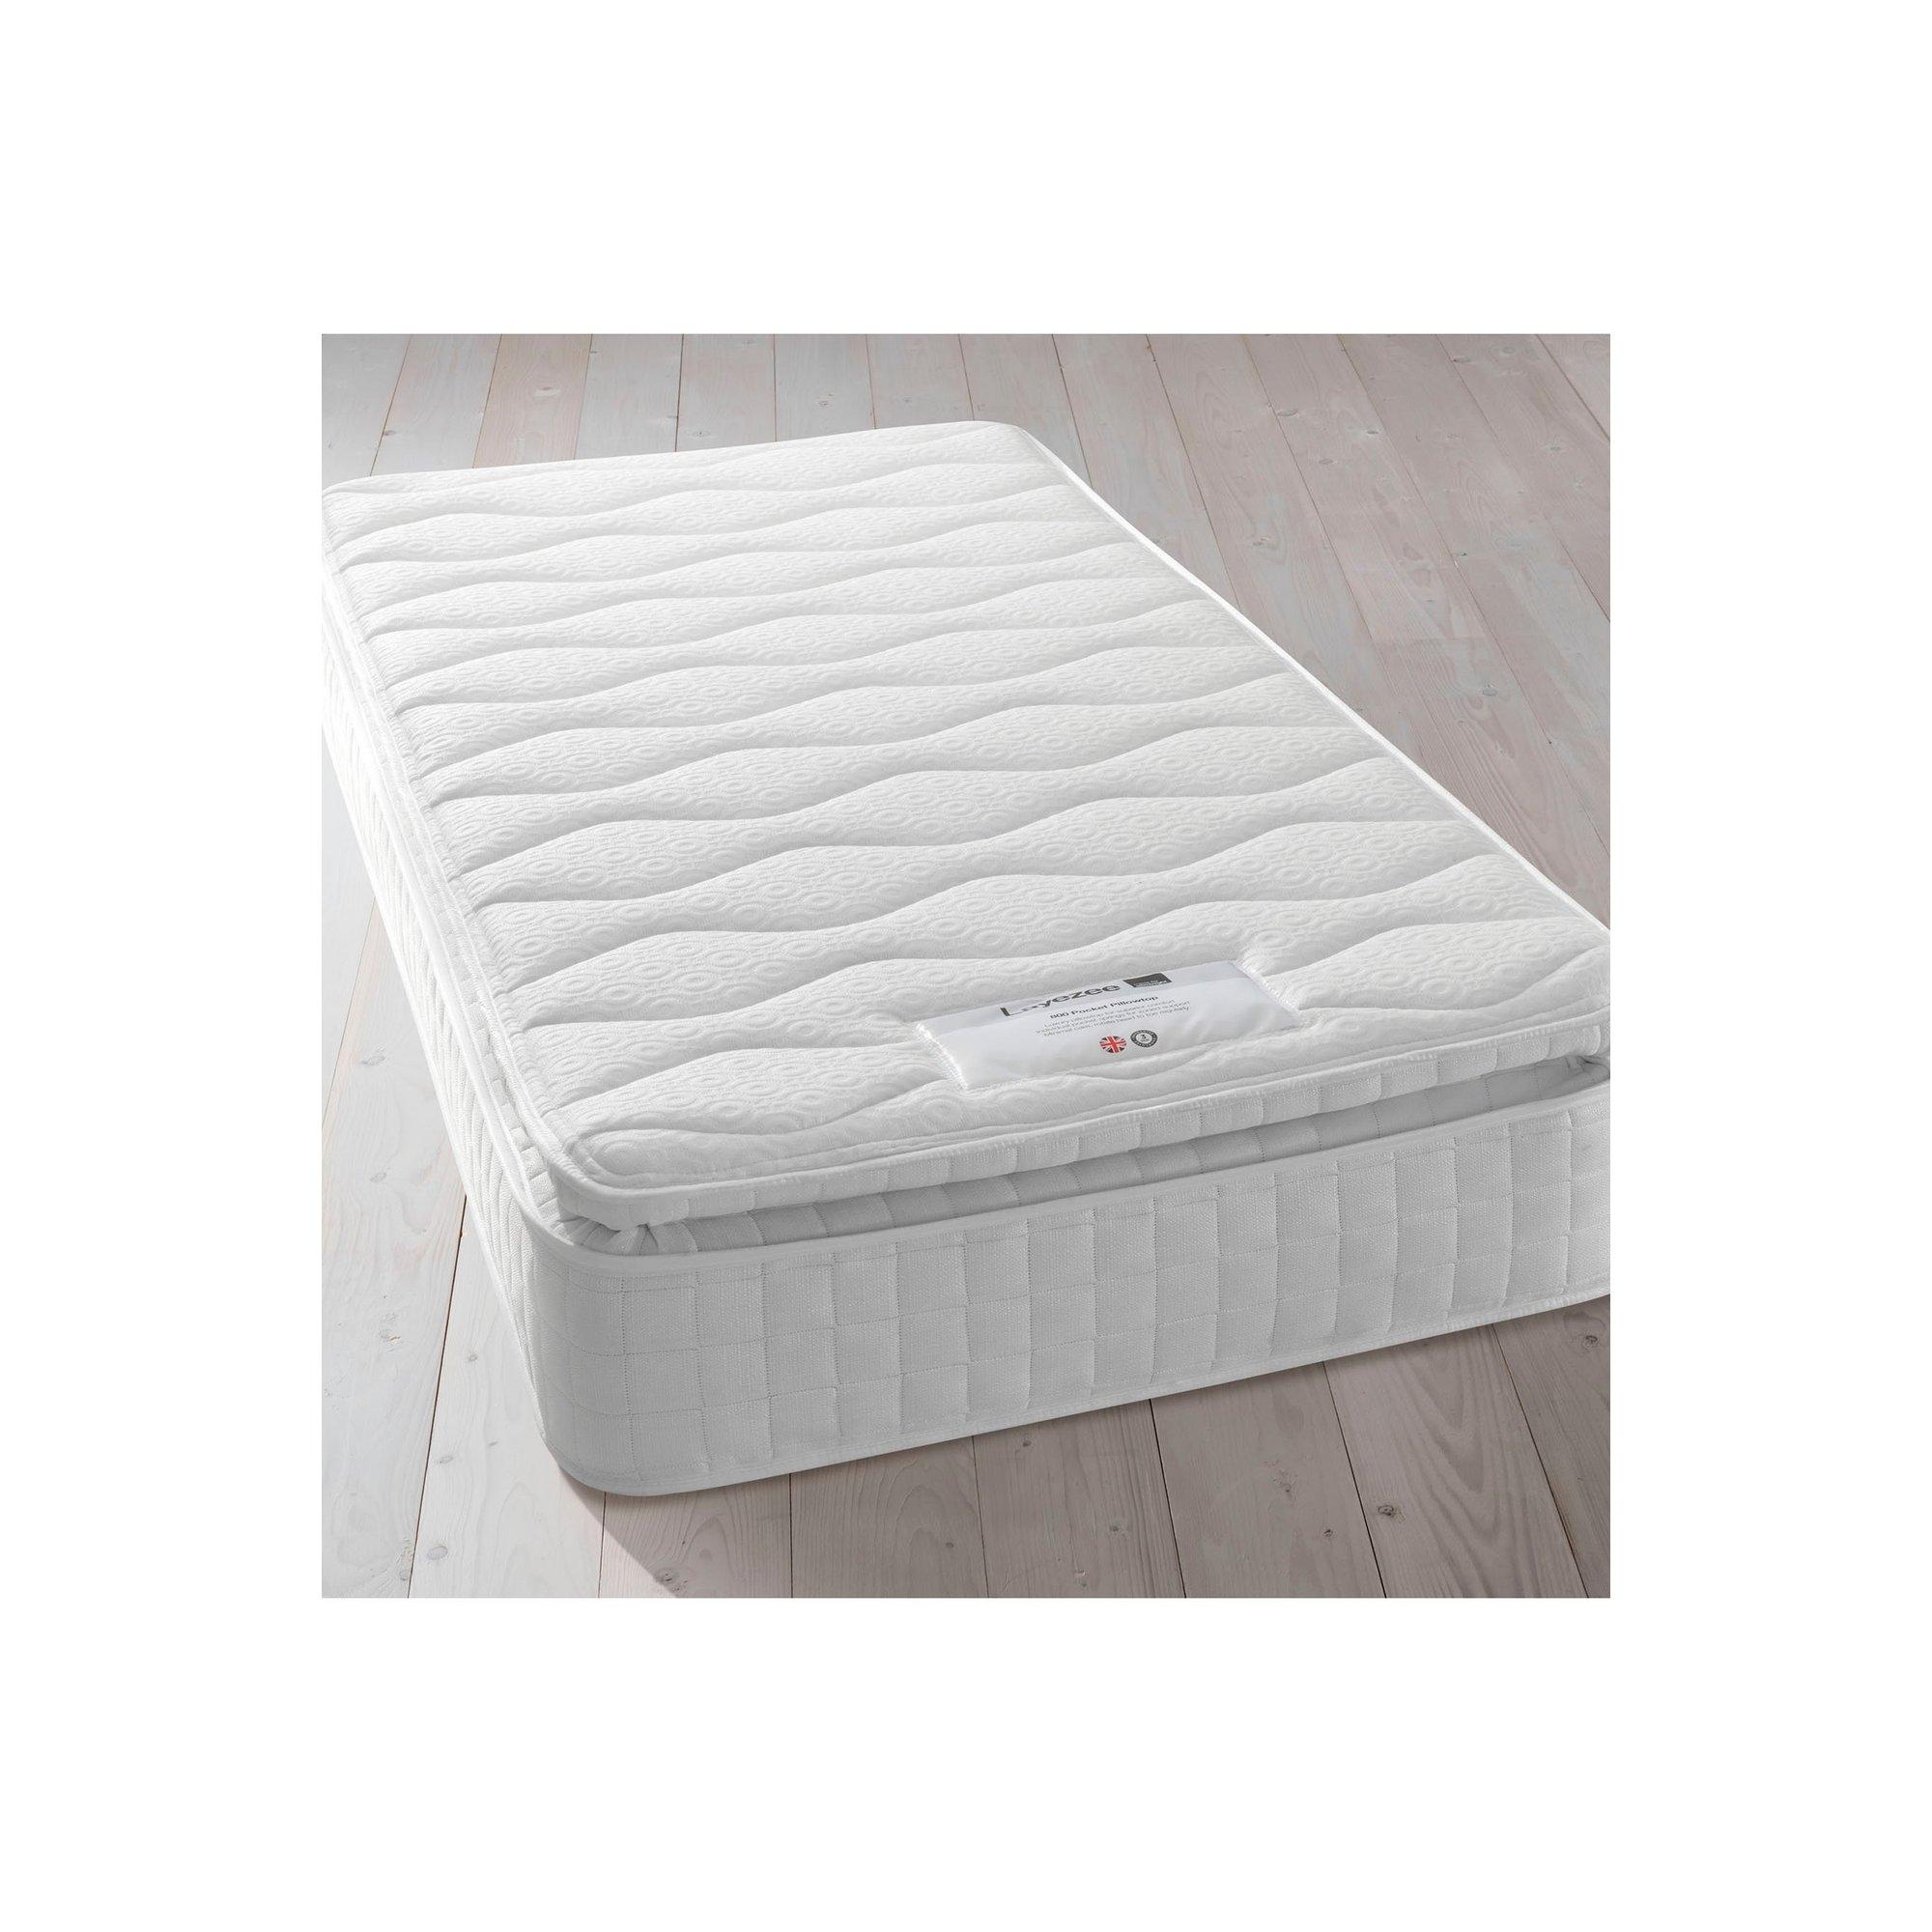 Image of 800 Pocket Pillow Top Mattress